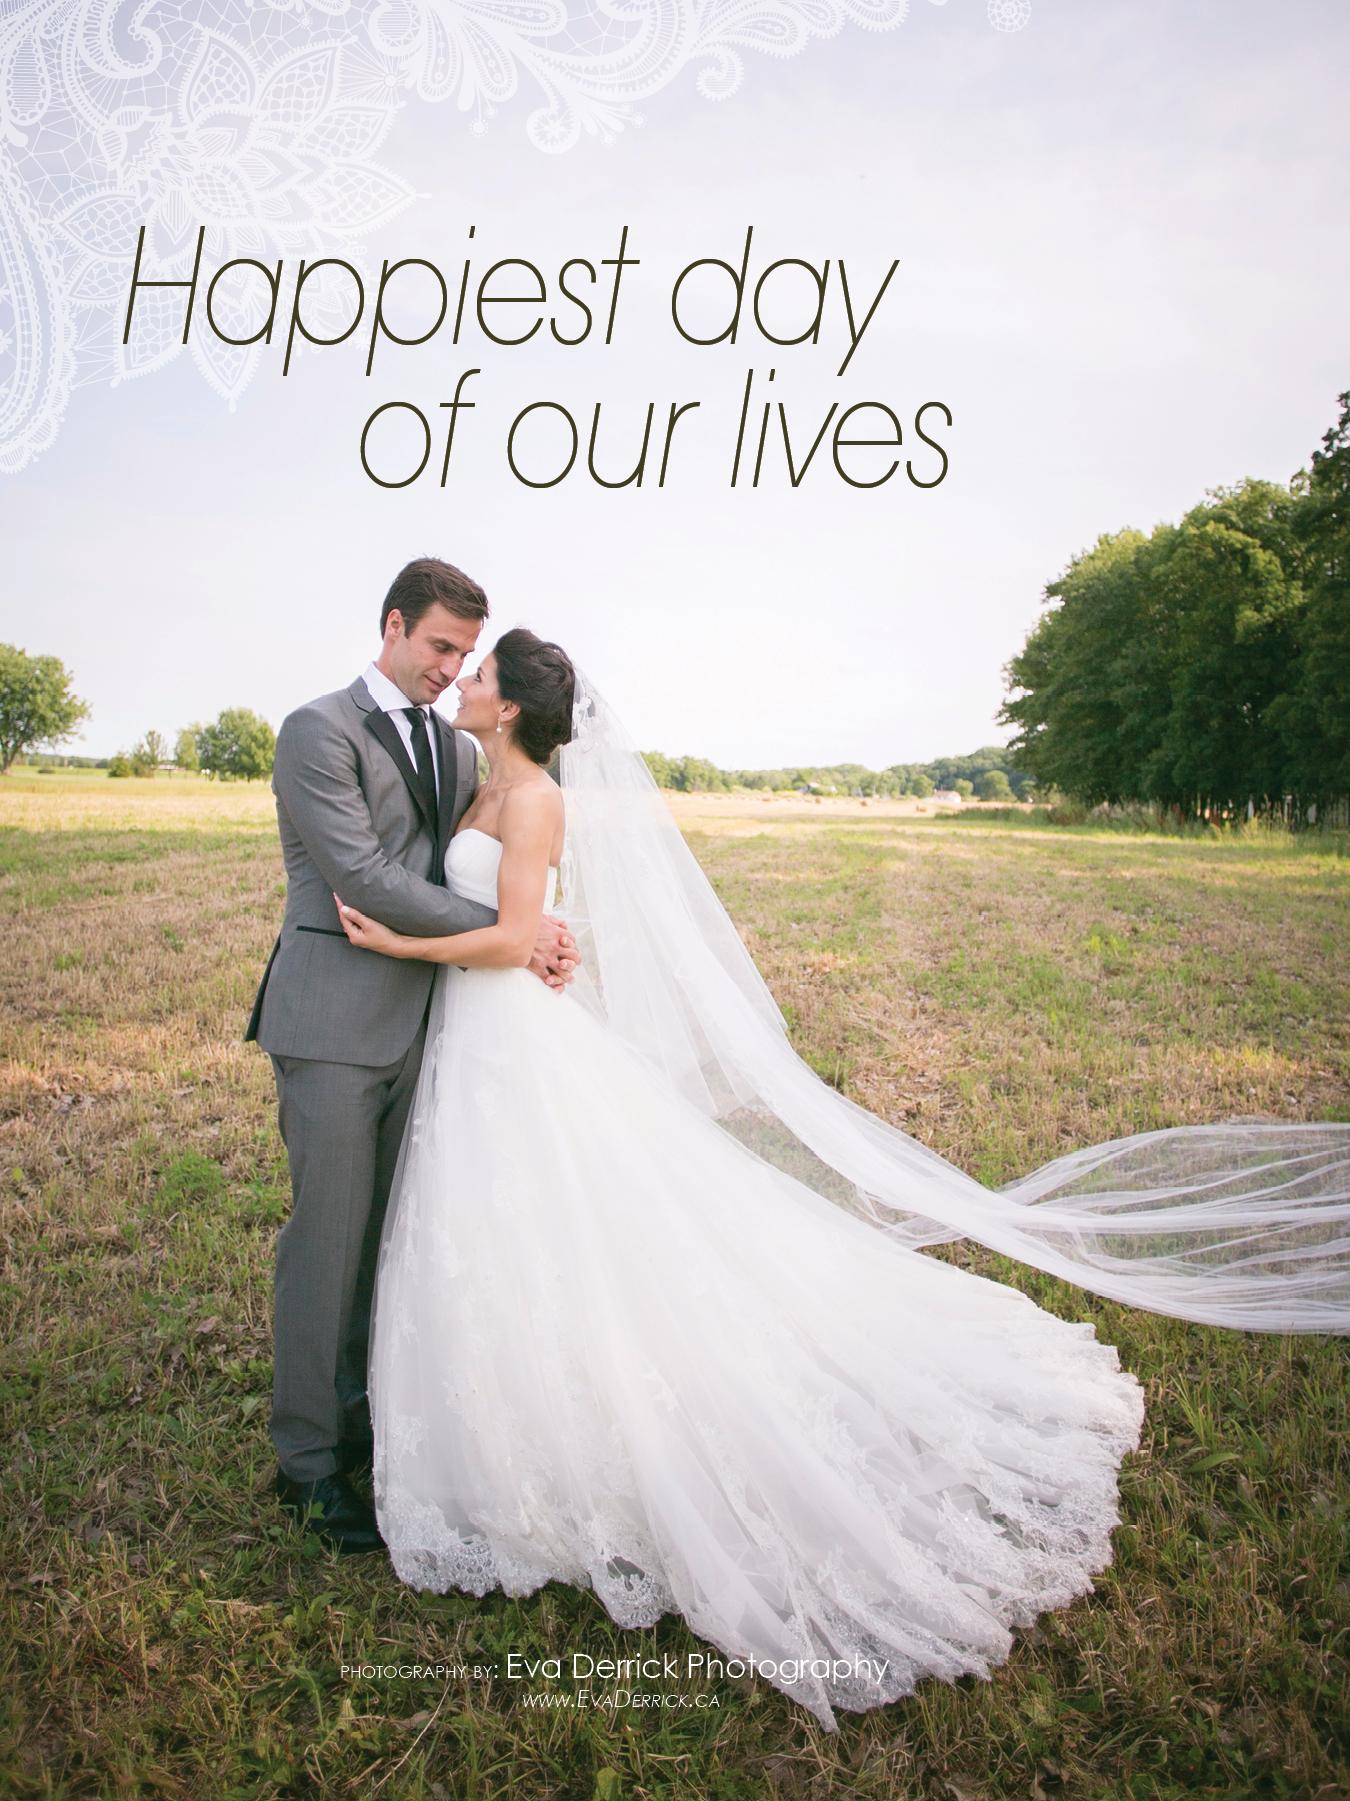 niagara-wedding-photographer-niagara-region-niagara-weddings-elegant-wedding-magazine-feature-nancy-kyle-chipchura-phoenix-coyotes-eva-derrick-photography-hernder-estate-wines-winery-vineyard-wedding-barn-wedding-4.jpg